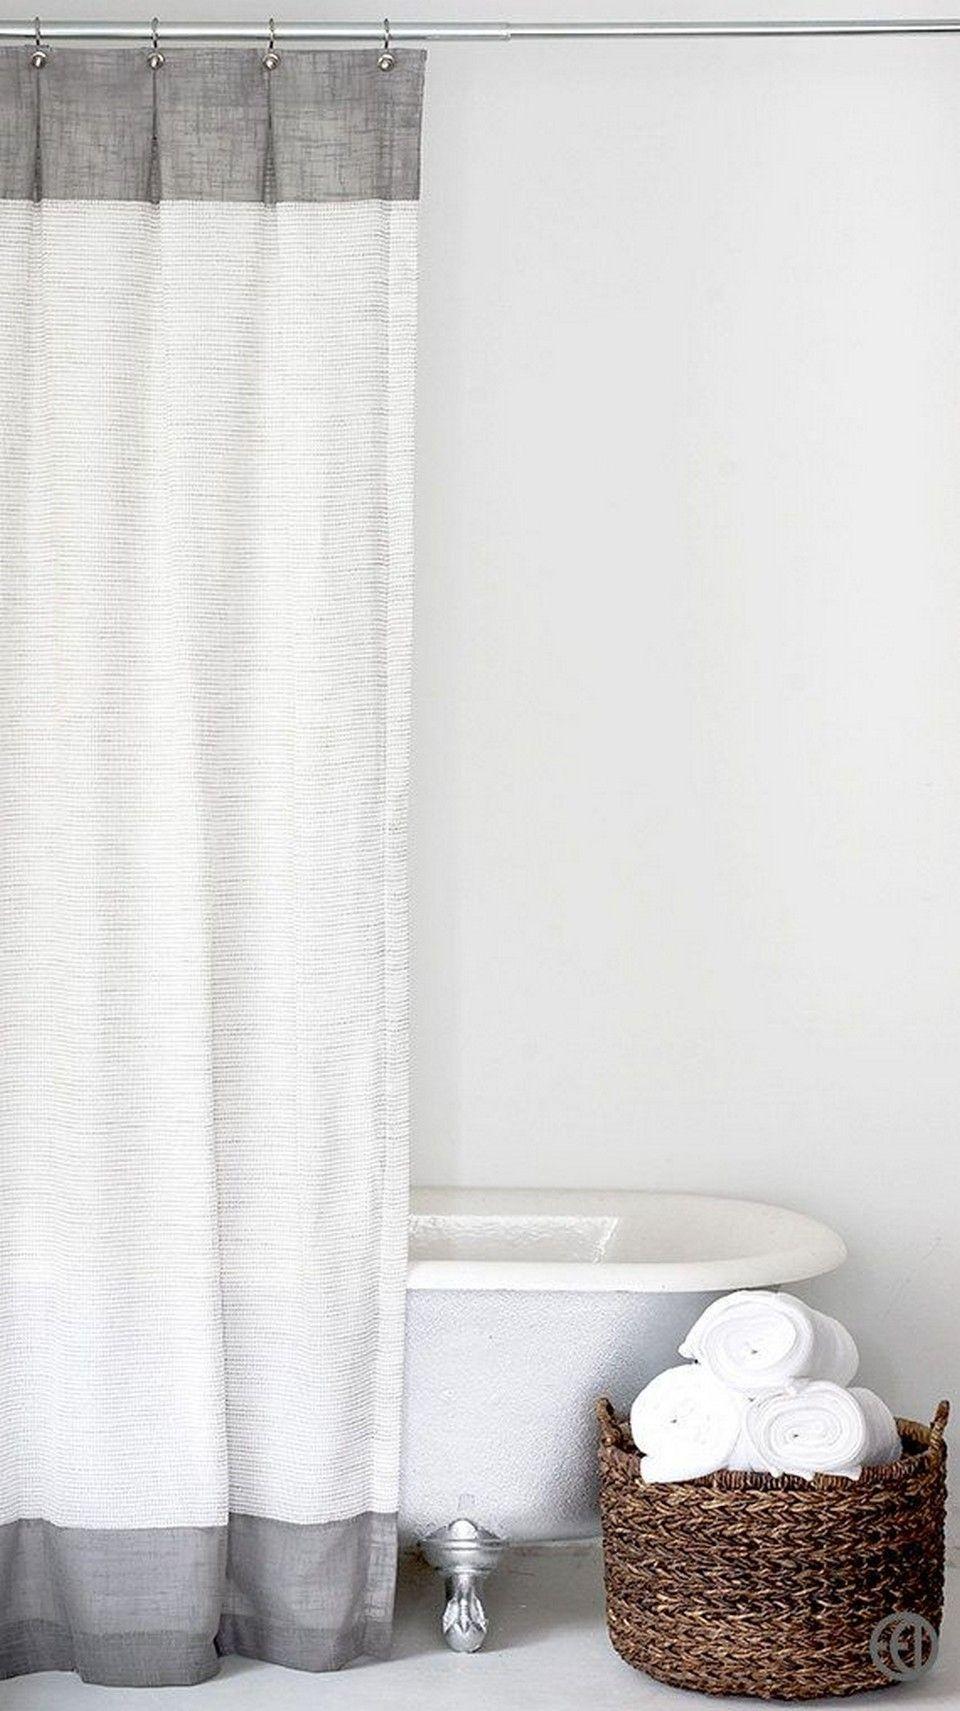 120+ Unique And Modern Bathroom Shower Curtain Ideas